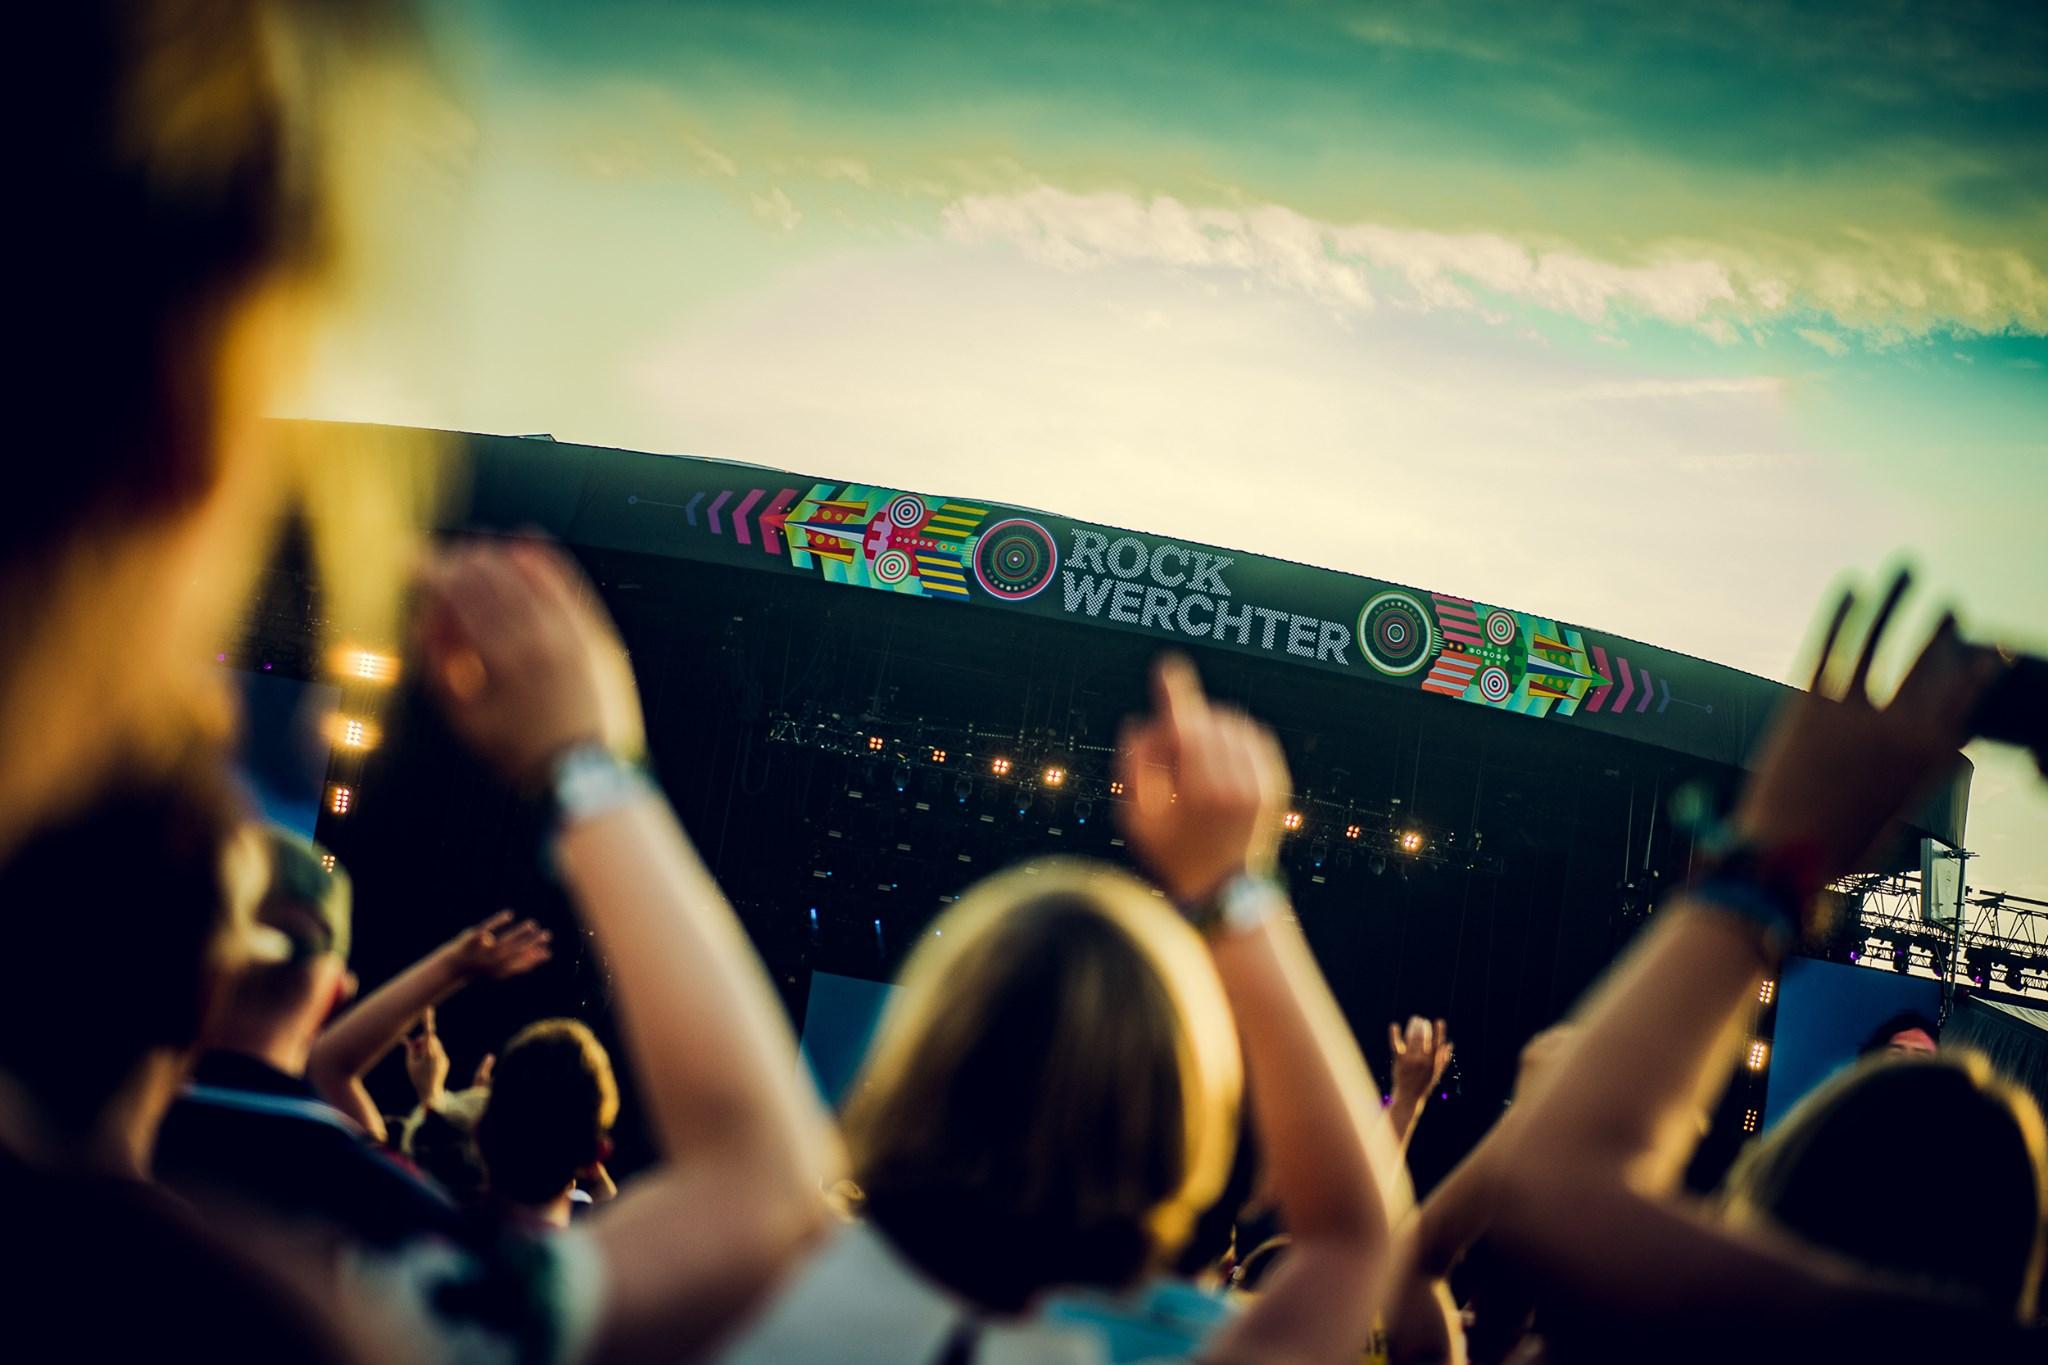 Rock Werchter Music Festival 2022